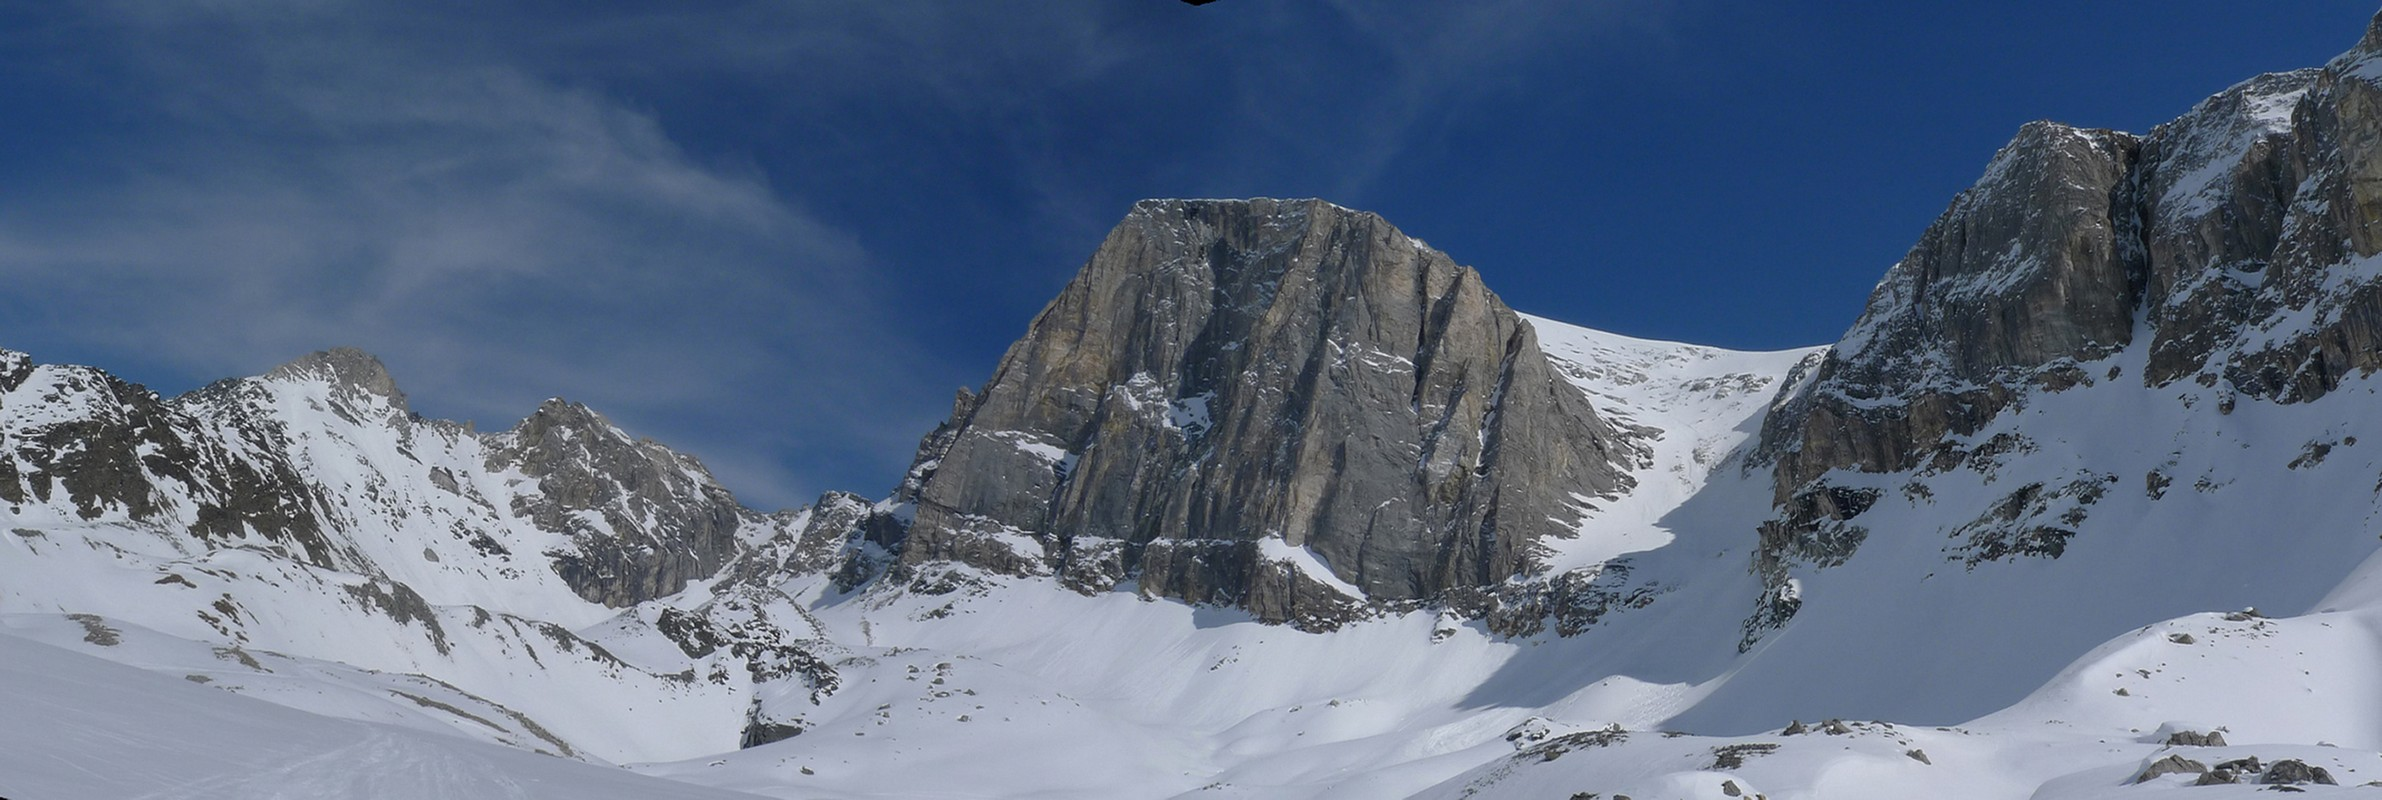 Turtmannhütte / Cabane Tourtemagne  Walliser Alpen / Alpes valaisannes Švýcarsko panorama 13